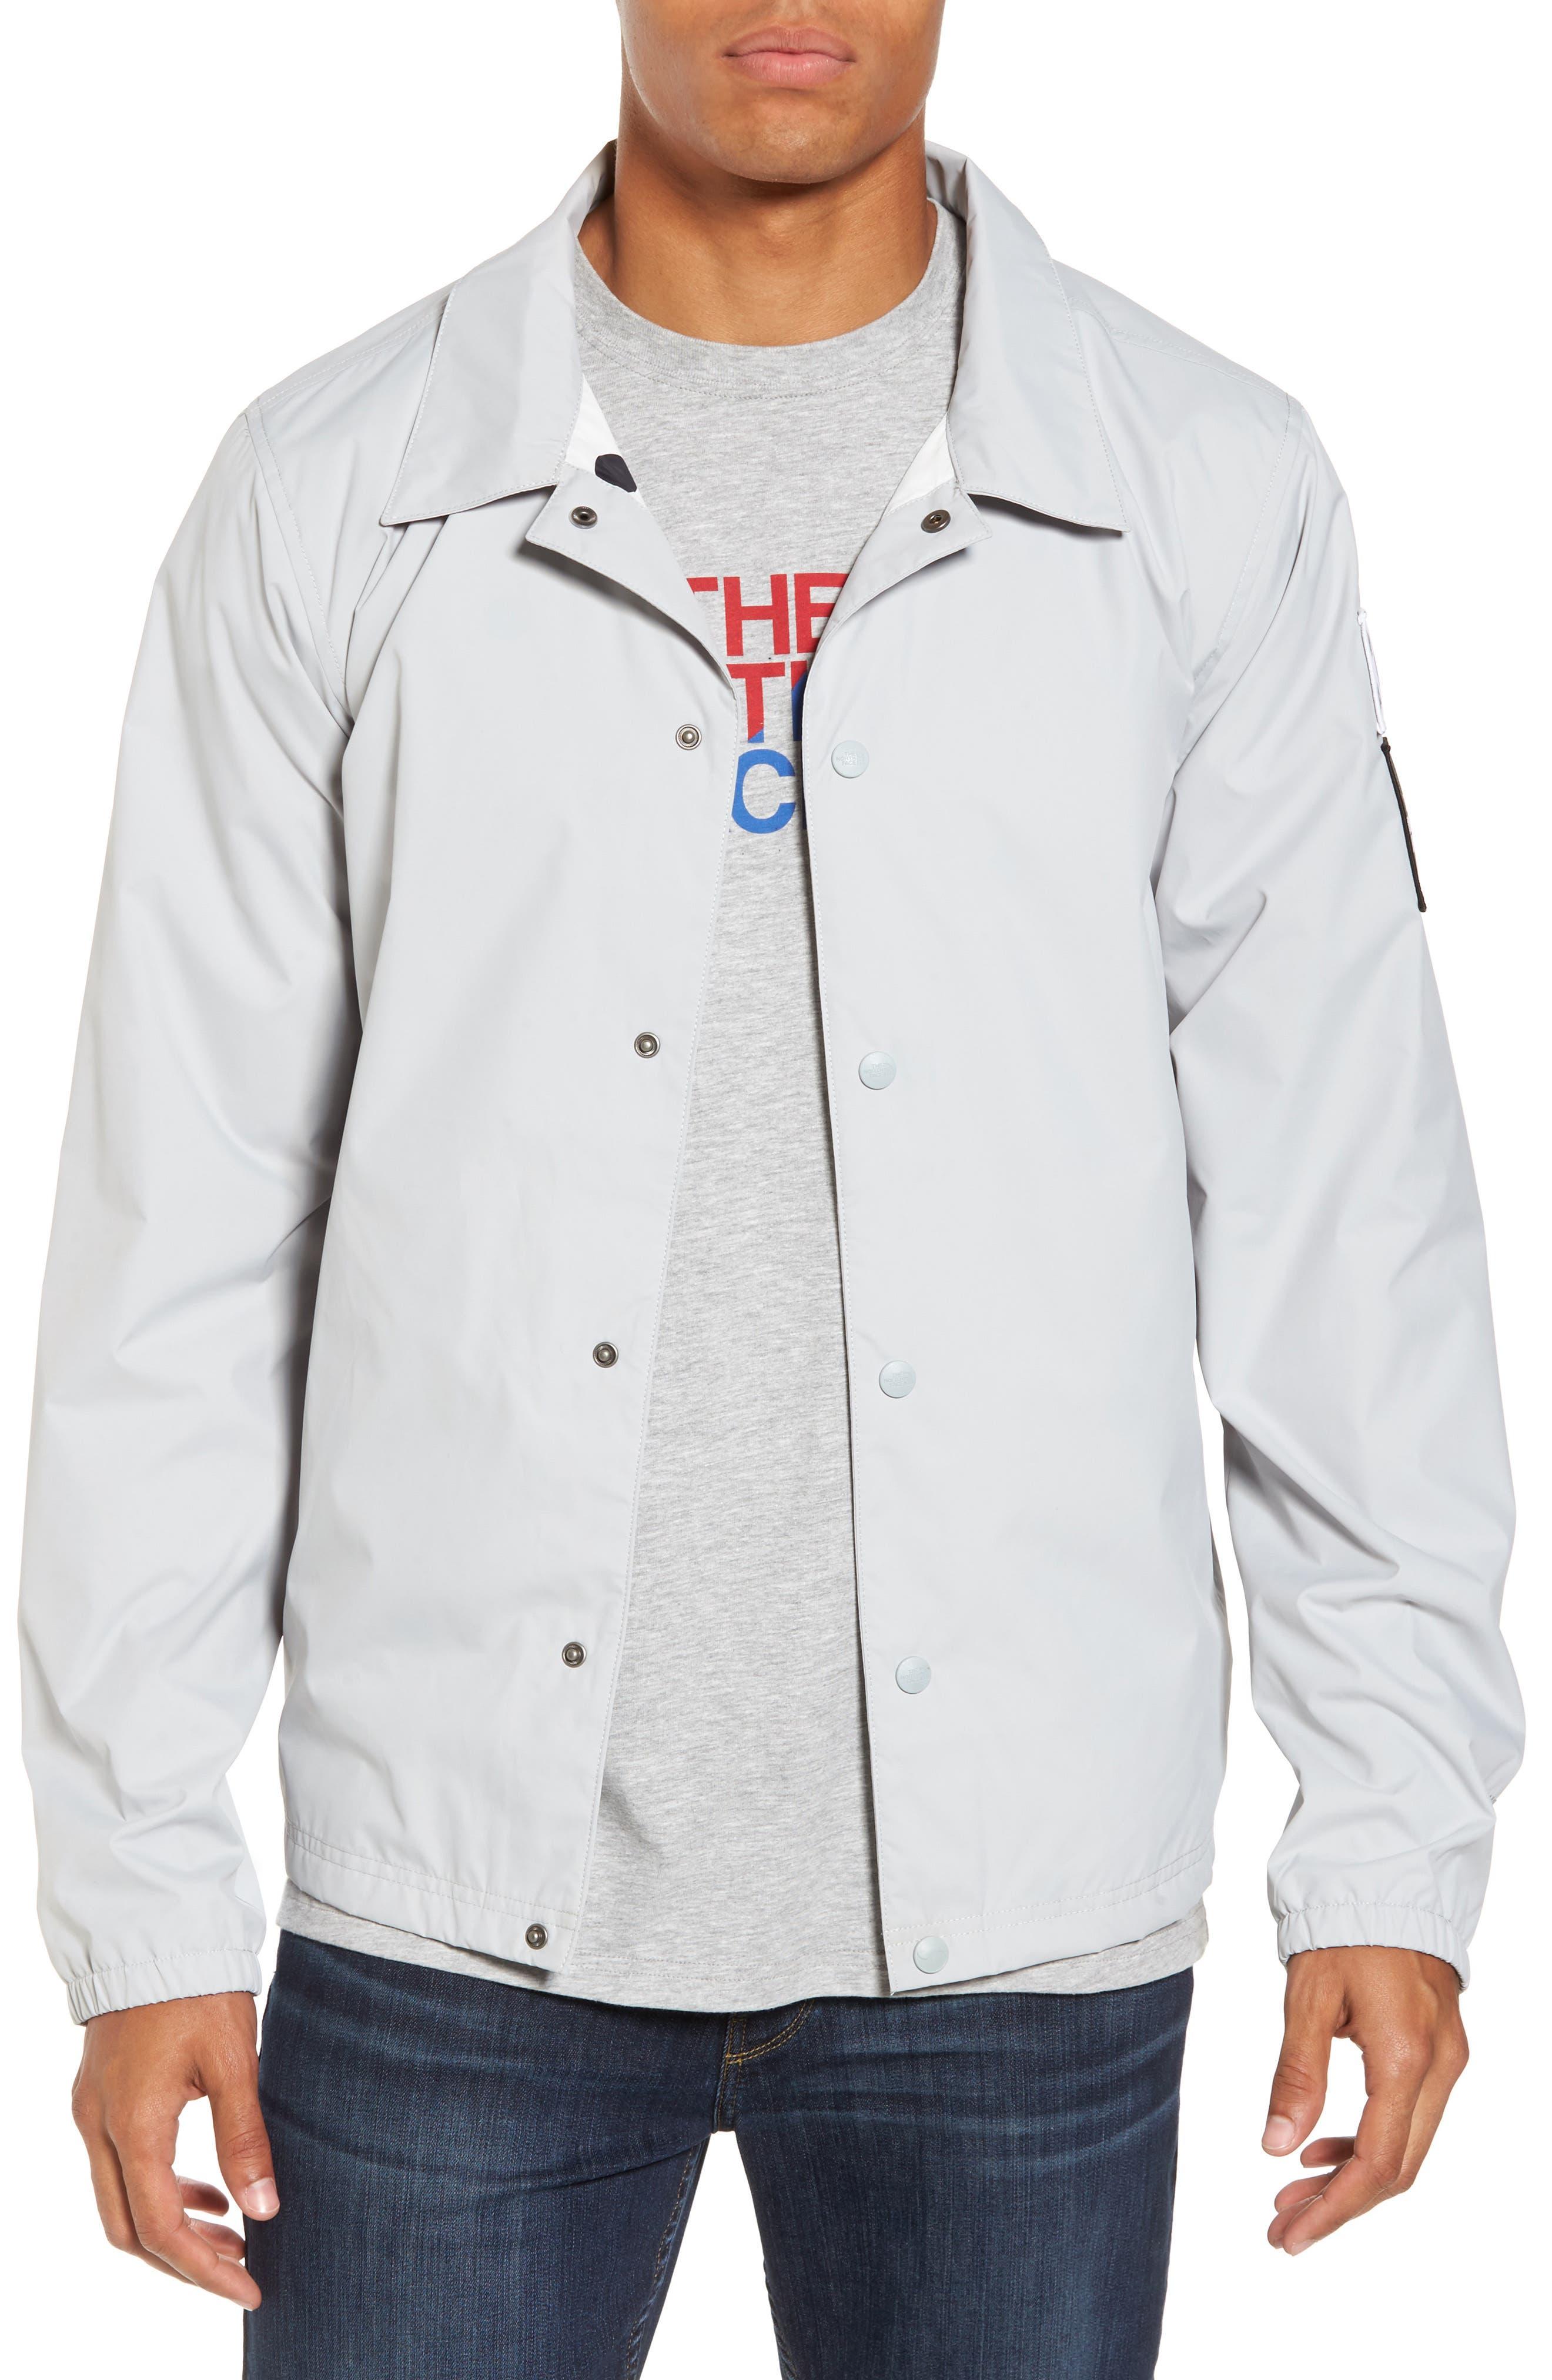 International Collection Coach Jacket,                             Main thumbnail 2, color,